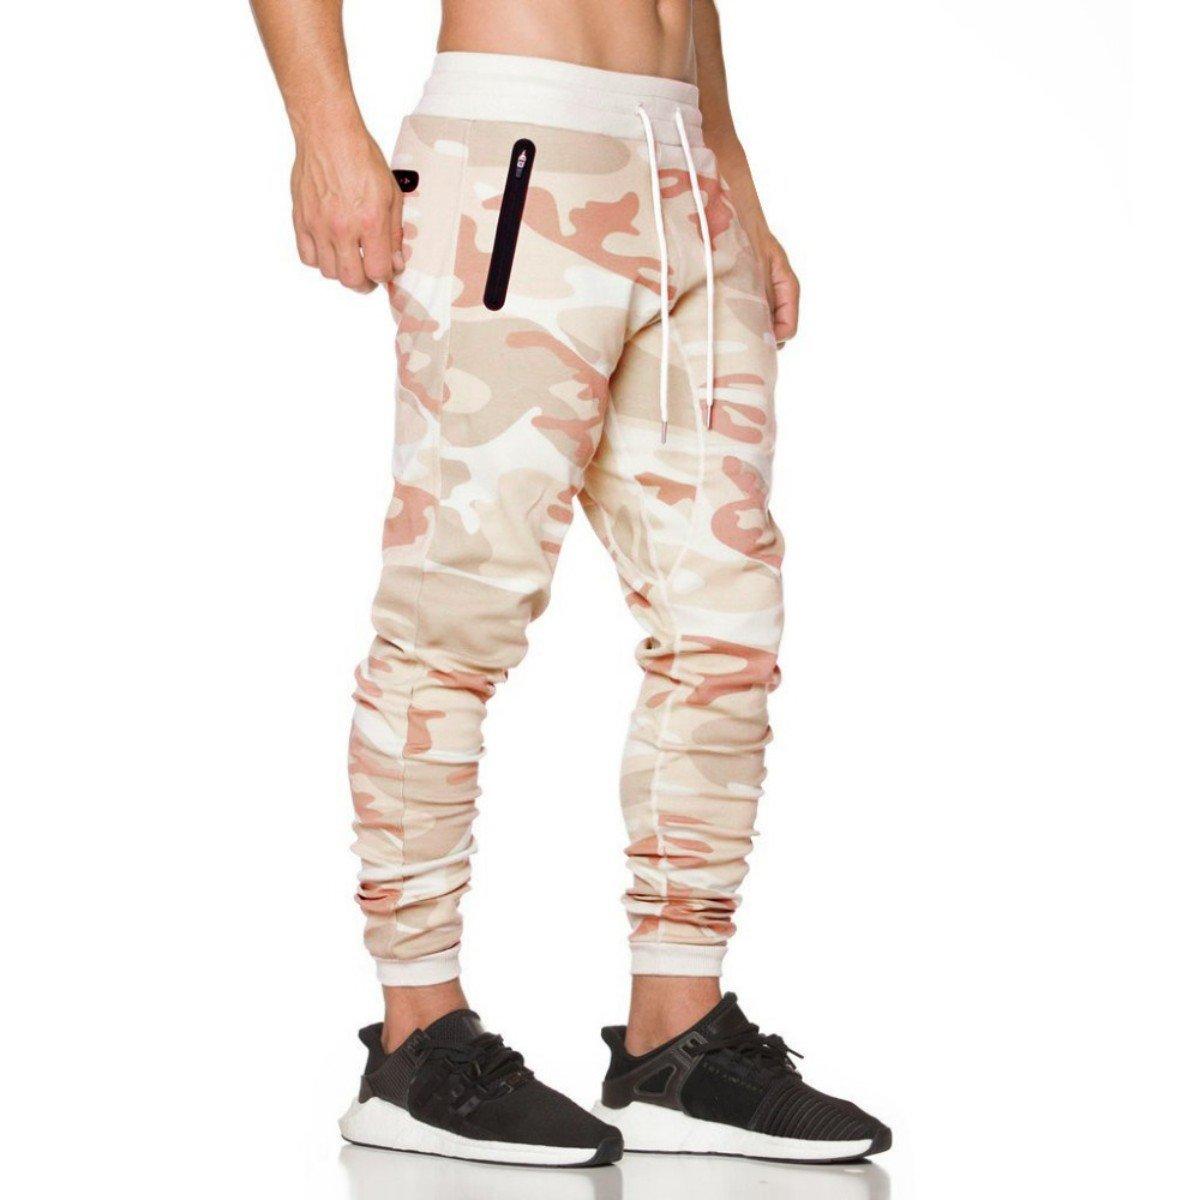 Coconut Ropamo CR Mens Jogger Pants Gym Fitness Trousers Tracksuit Slim Fit Bottoms Training Sweatpants Zipper Pockets